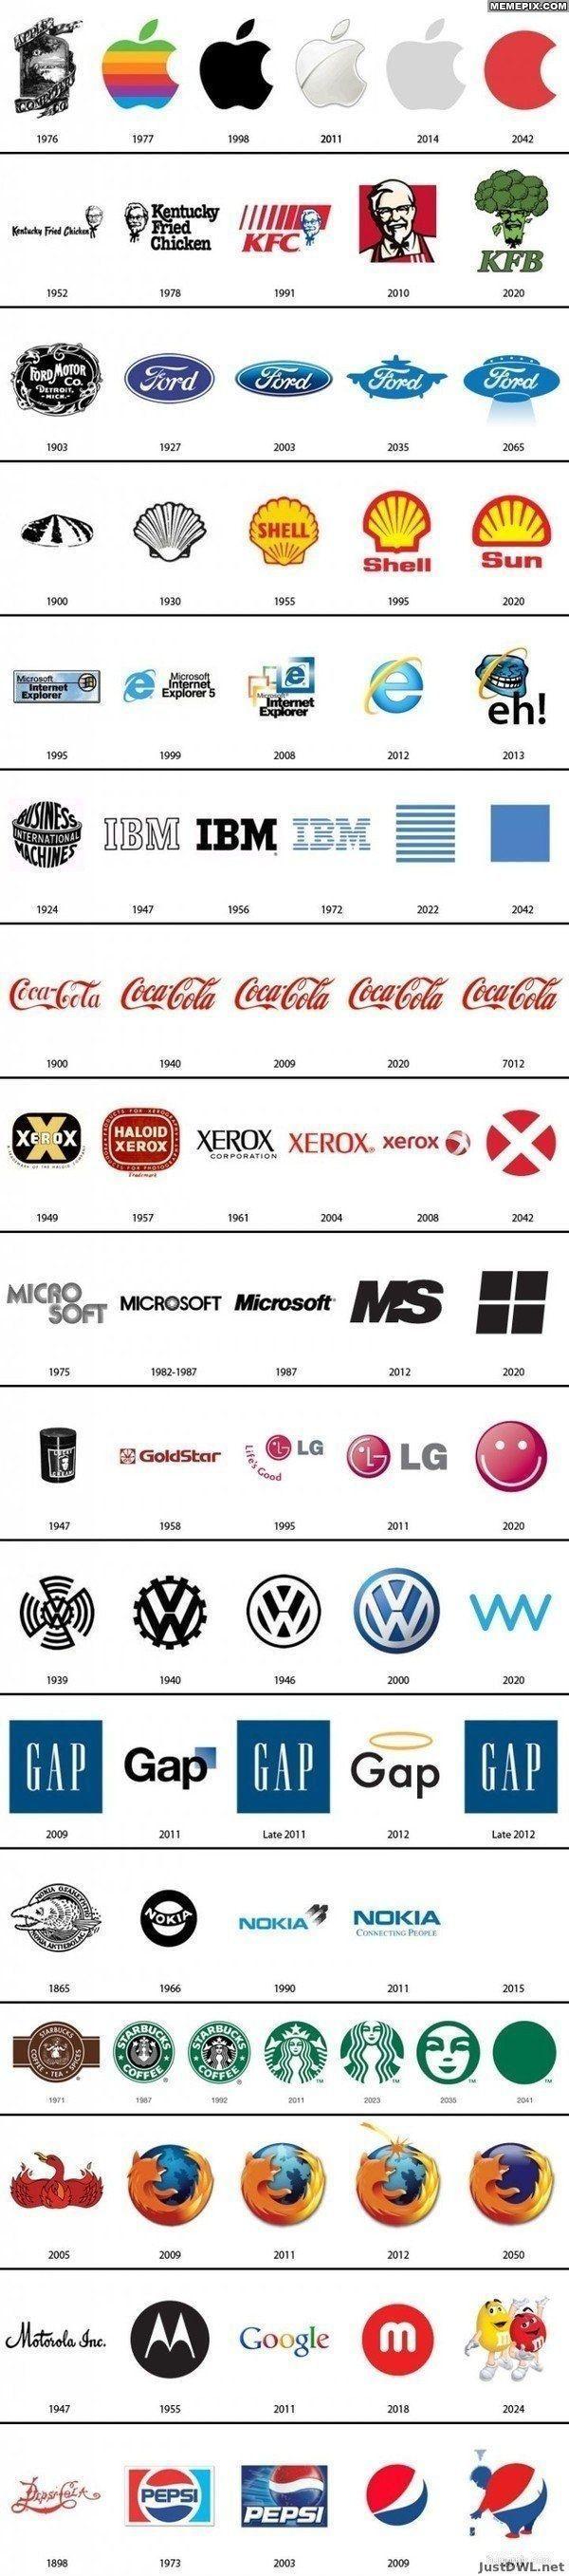 Evolution of the logo.... I like the last coke date lol